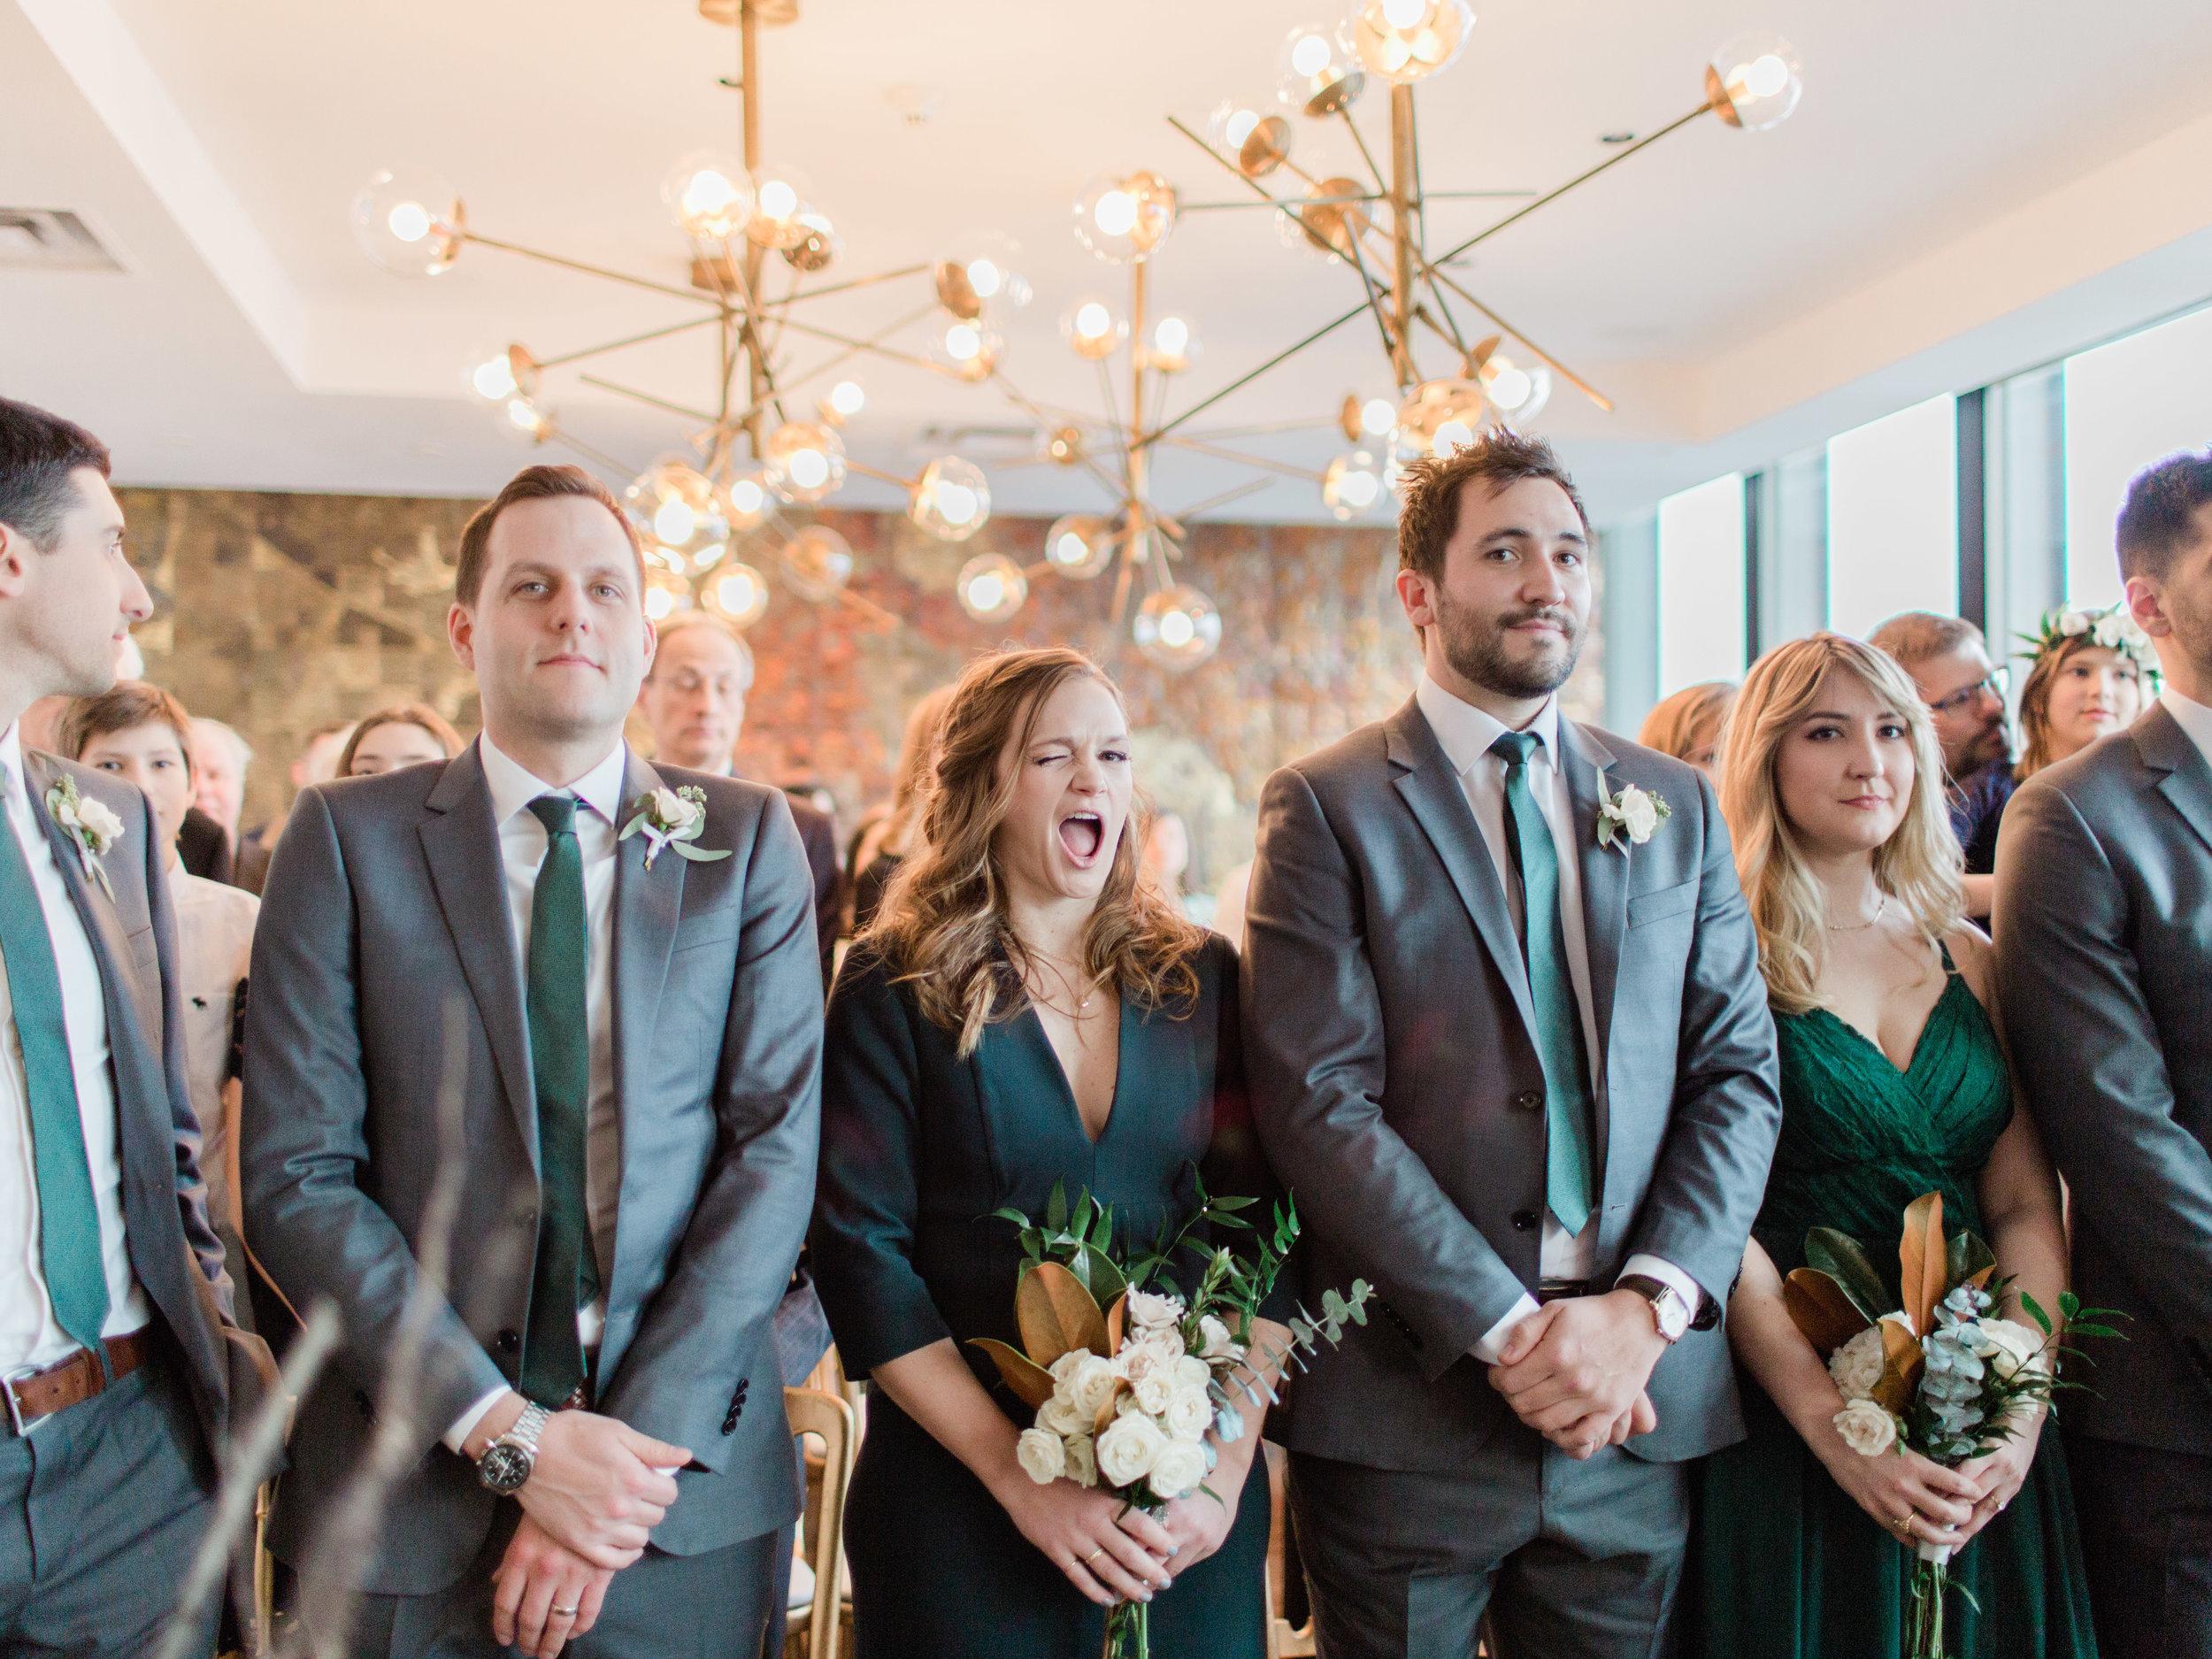 Toronto-wedding-photographer-downtown-winter-wedding-intimate-restaurant-canoe131.jpg